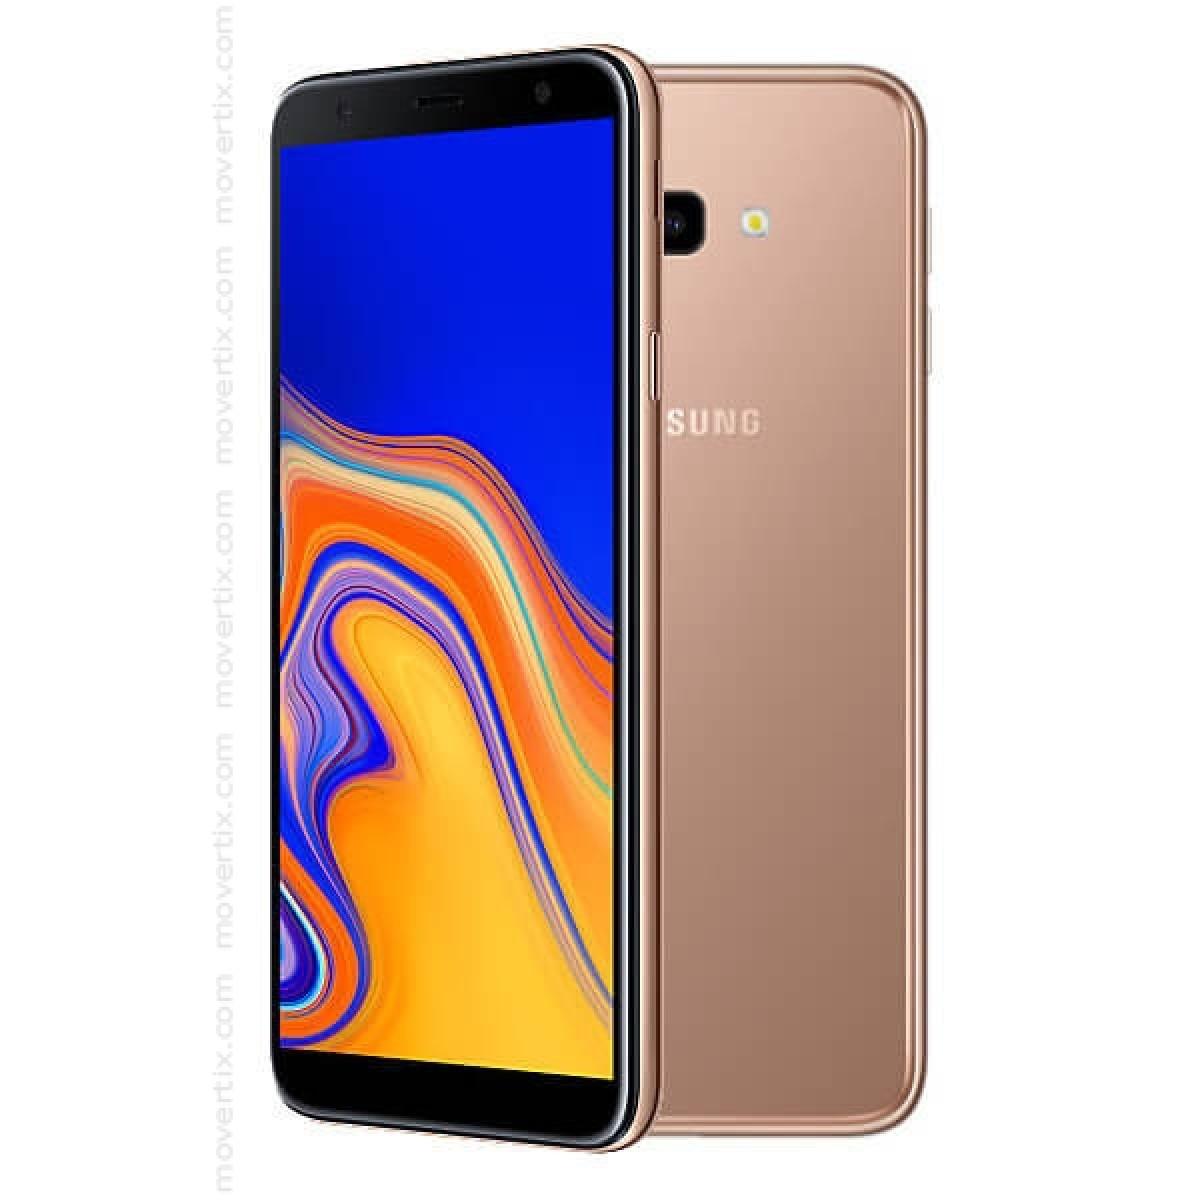 Samsung Galaxy J4 Plus (2018) Dual SIM Gold (SM-J415F/DS)